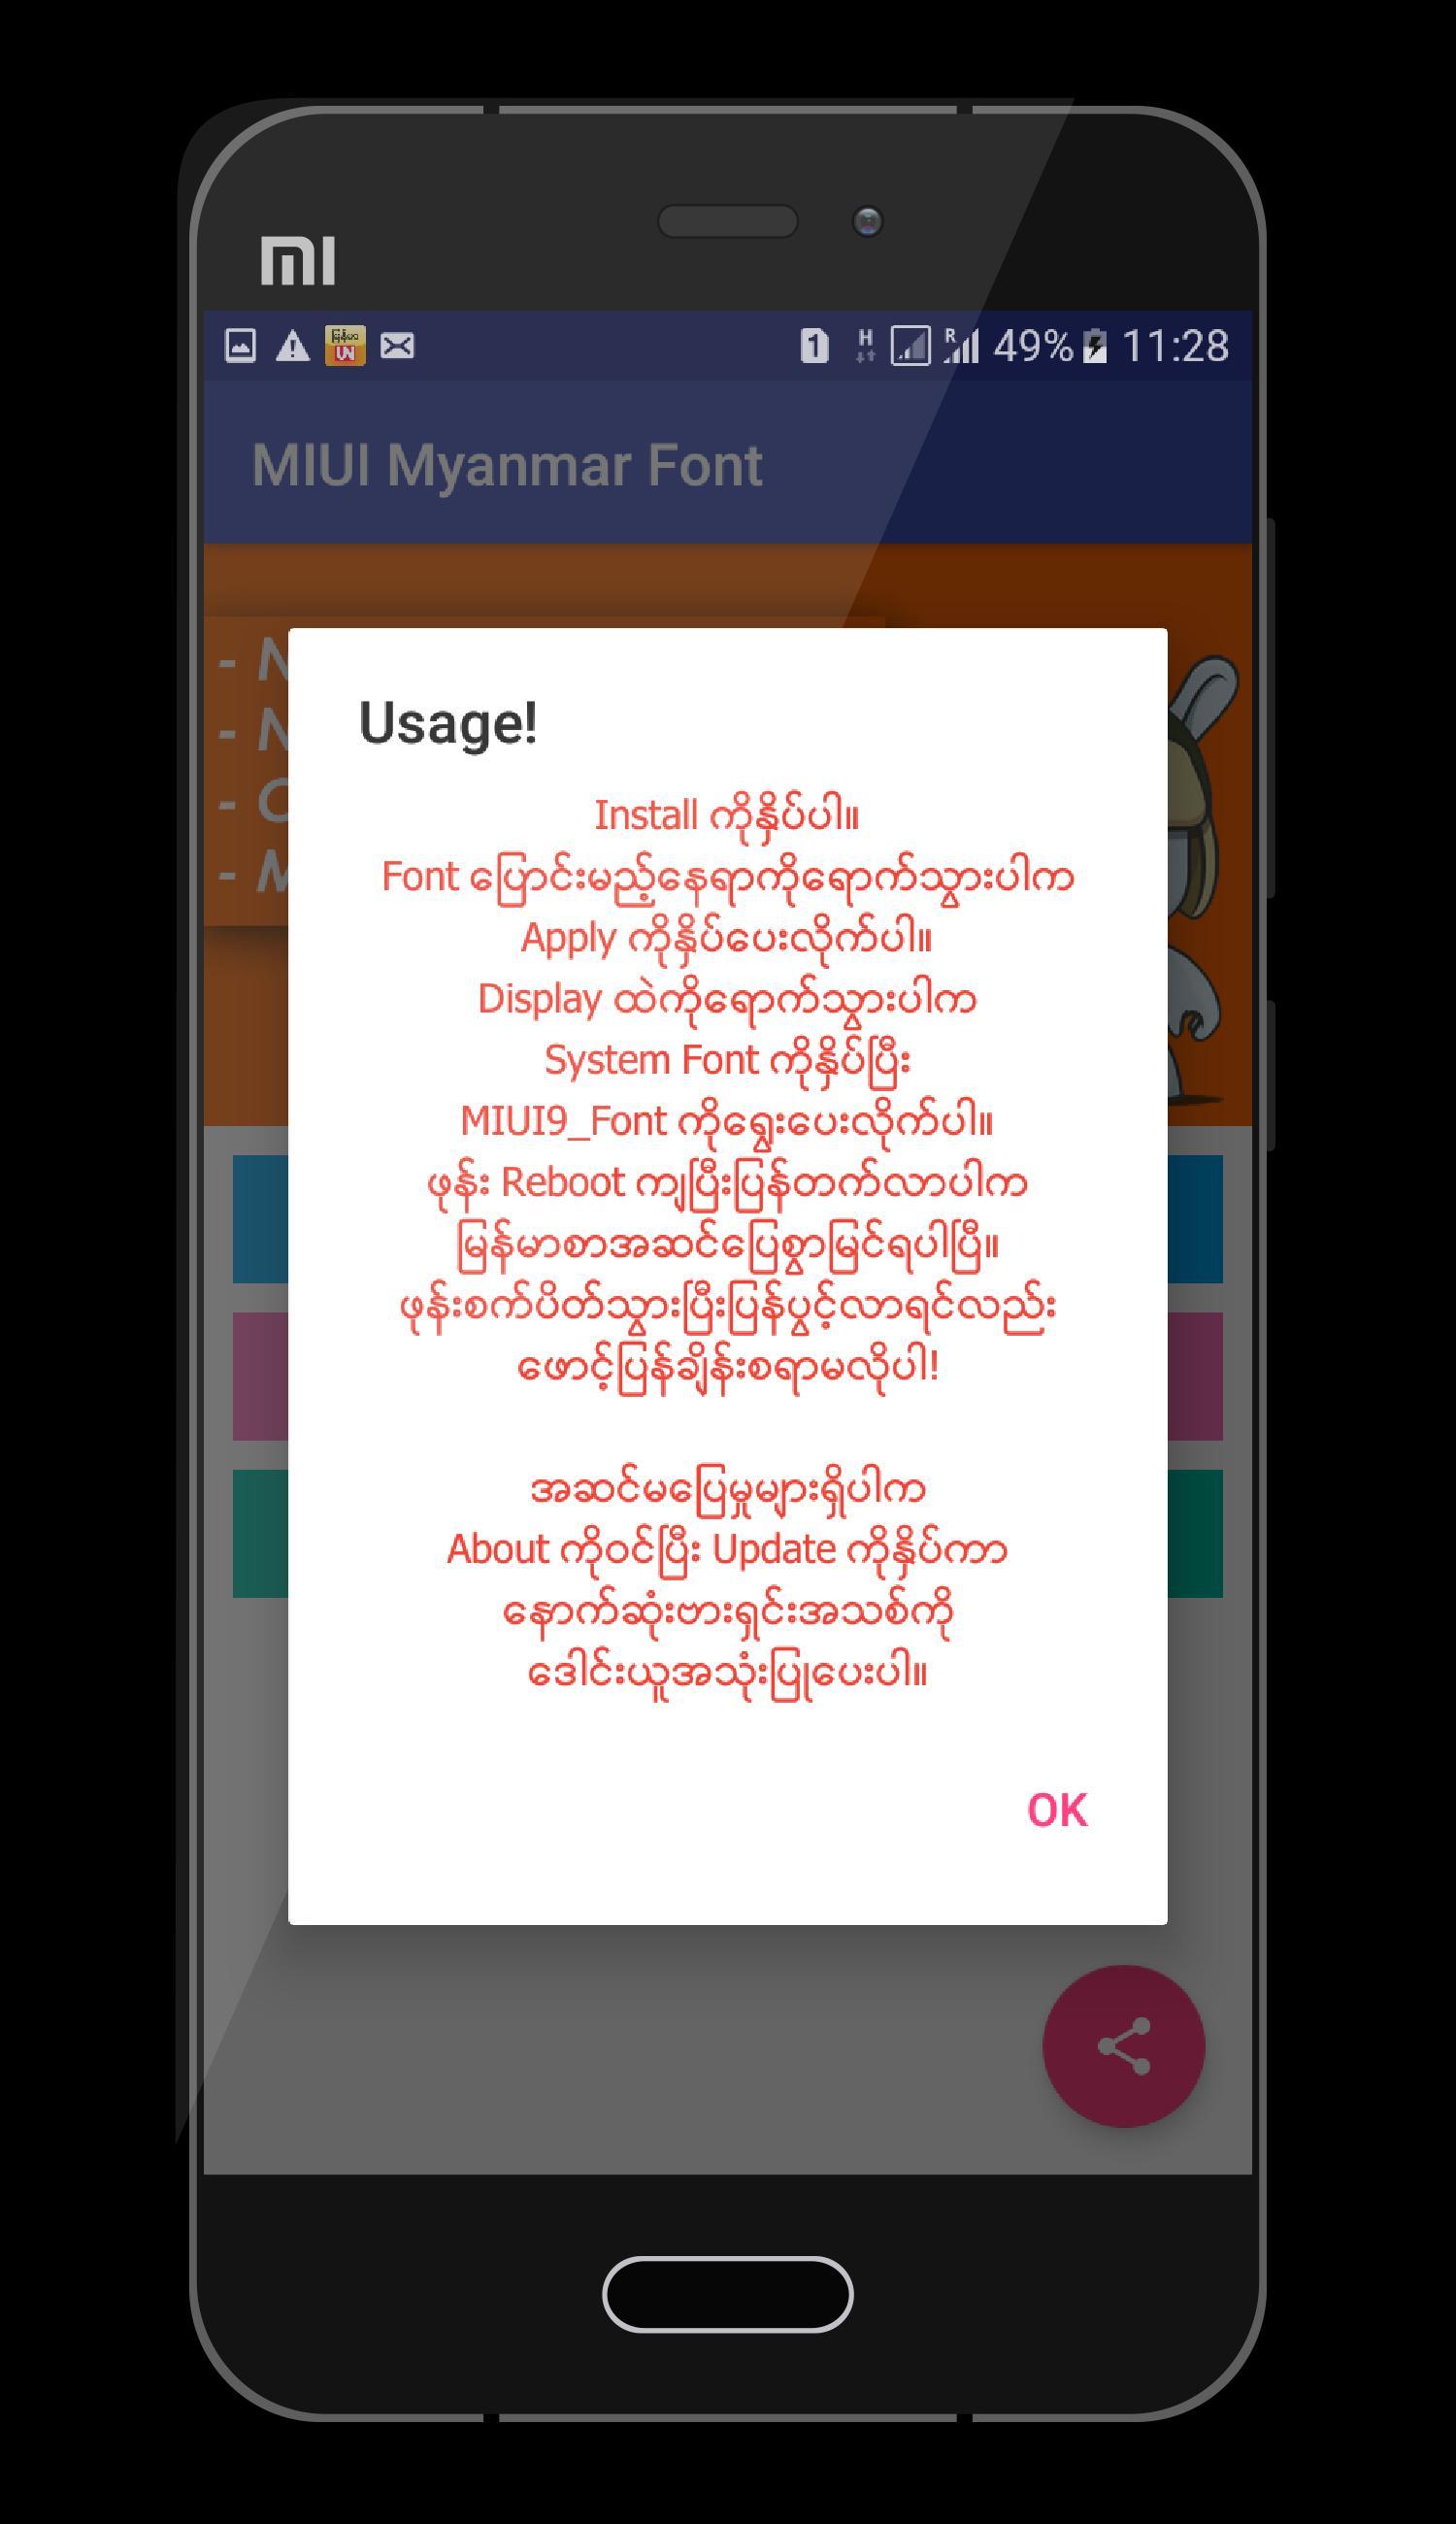 Mi Myanmar Font (MIUI 6,7,8,9) for Android - APK Download